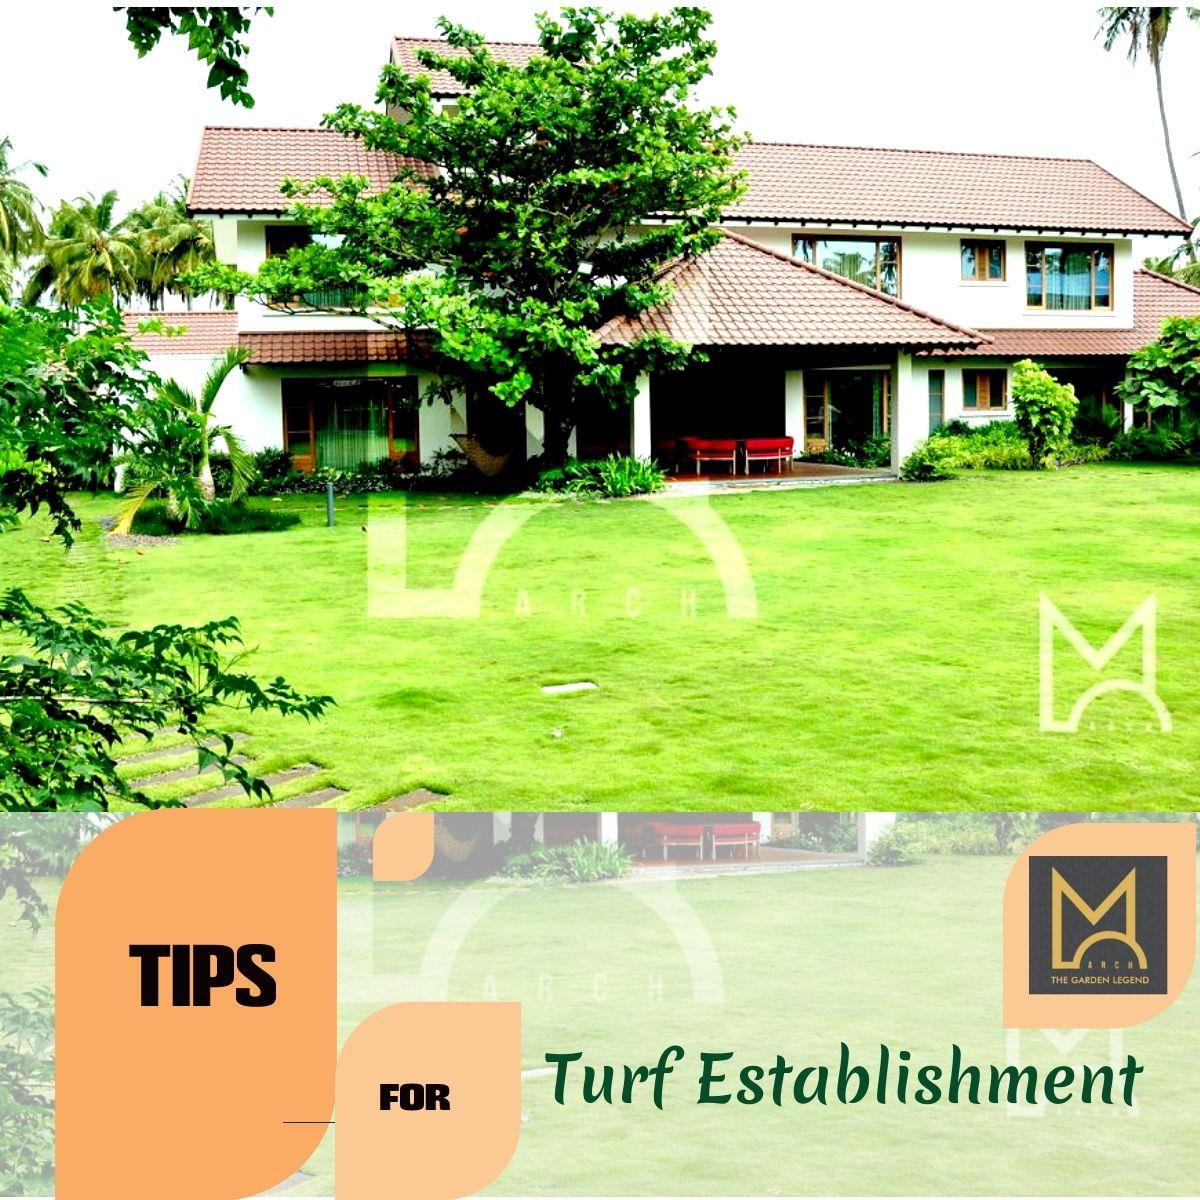 M Arch Garden Tips For Turf Establishment Landscape Maintenance Landscape Design Landscaping Company